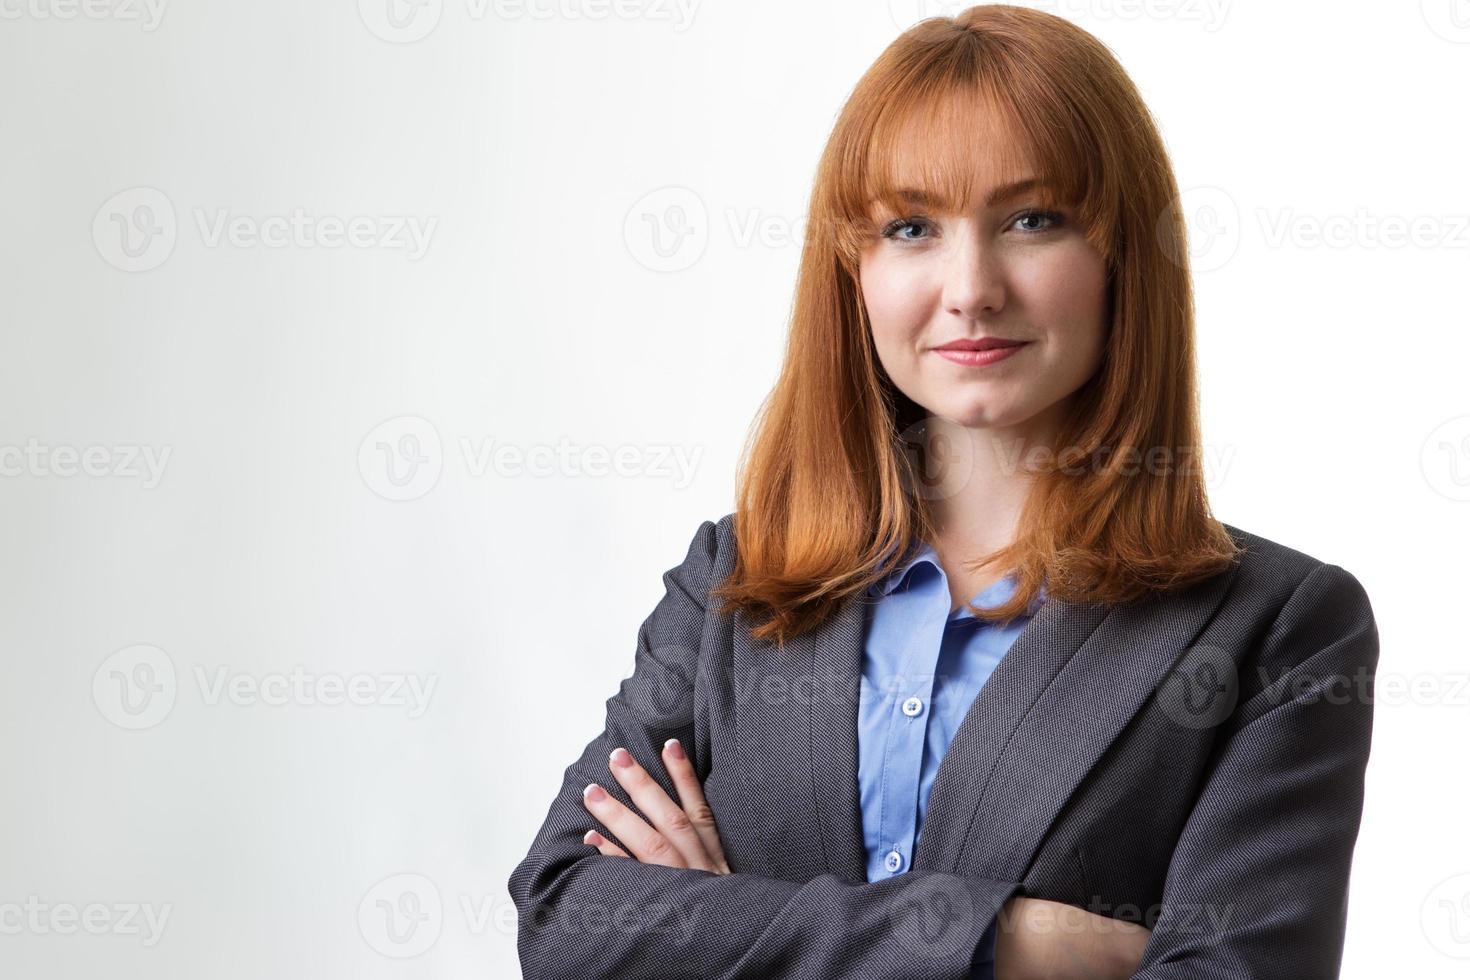 vrouw in zaken foto